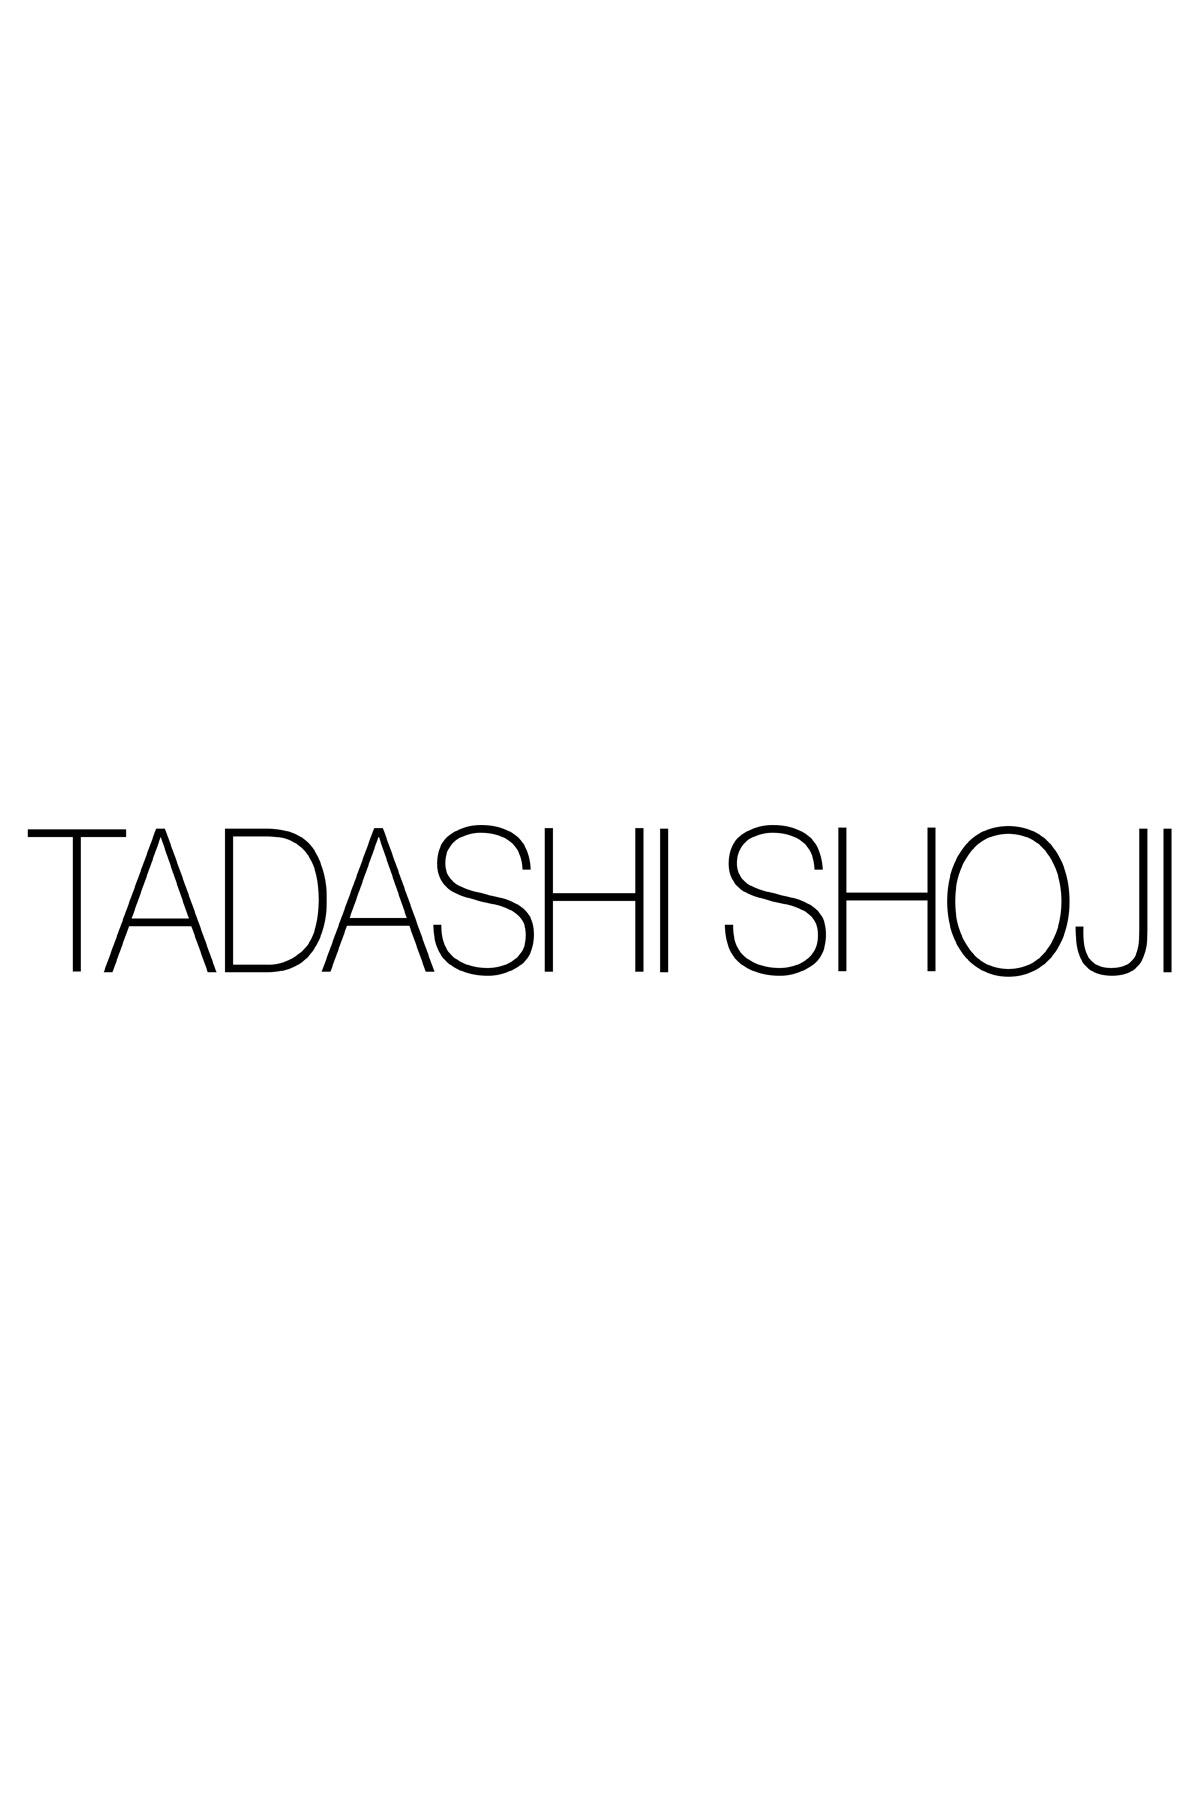 Tadashi Shoji Petite Size - Paillette Embroidered Tulle Sheath with 3/4 Sleeves - Detail